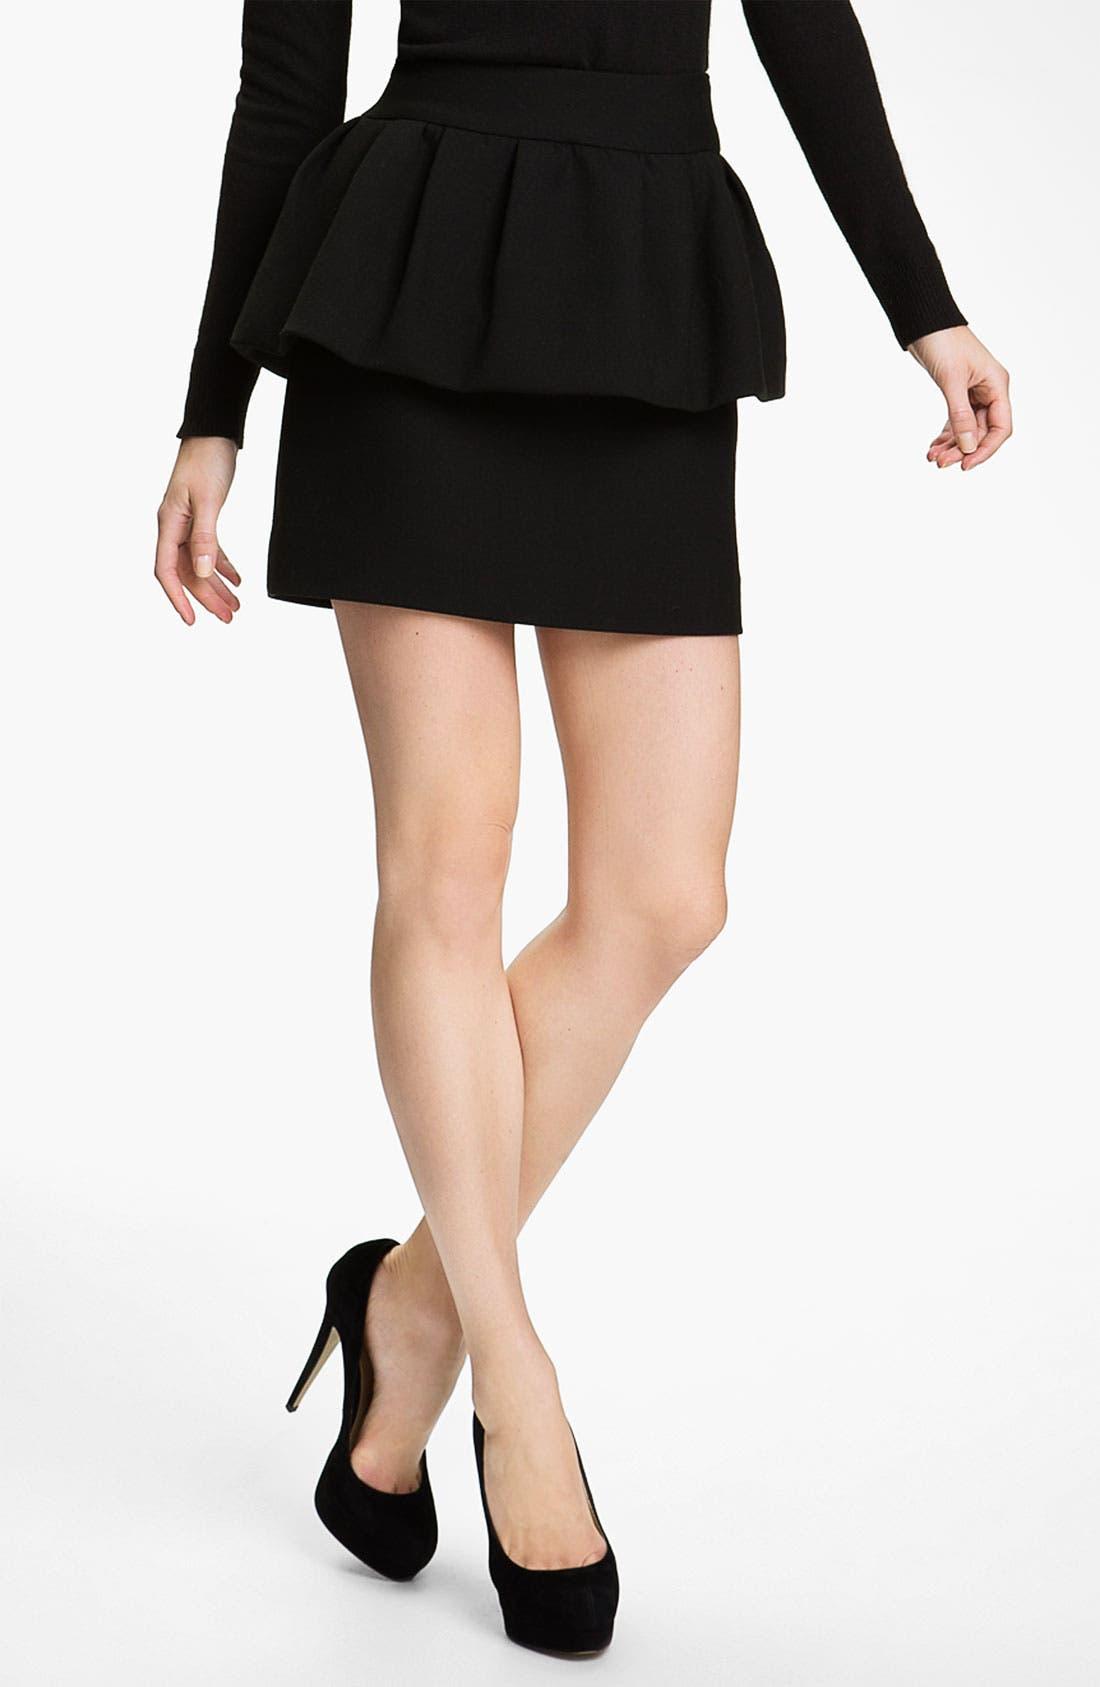 Alternate Image 1 Selected - Milly 'Laurel' Peplum Skirt